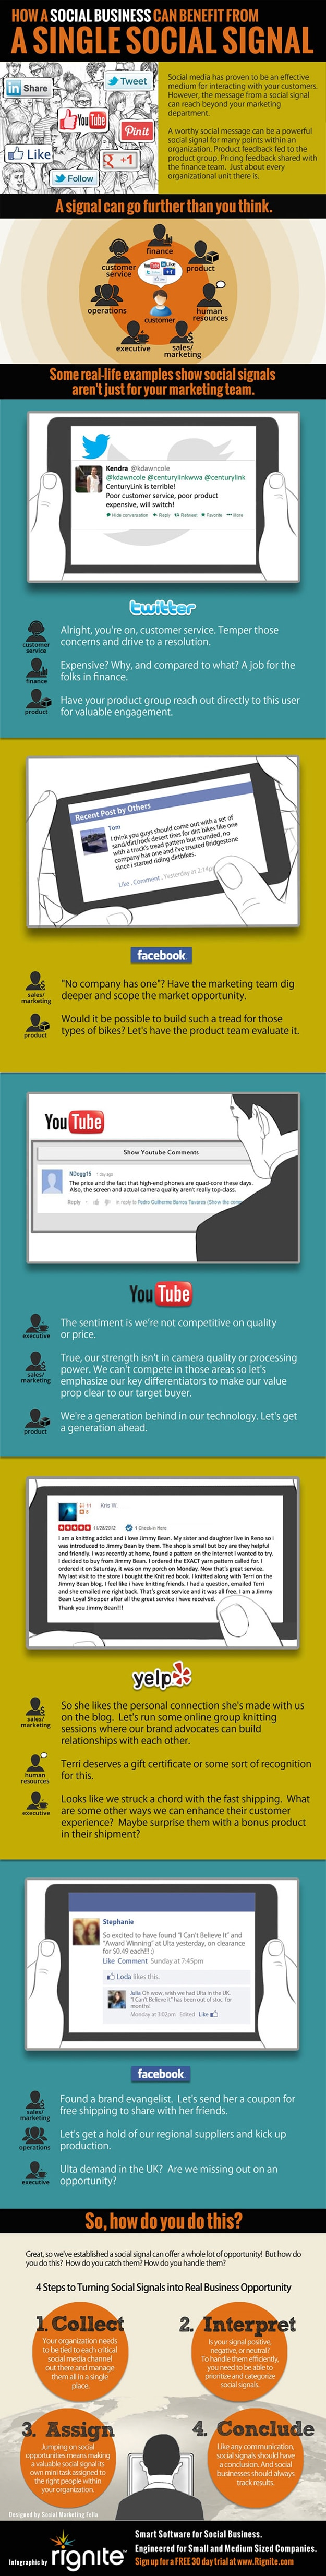 companies-benefit-more-social-media